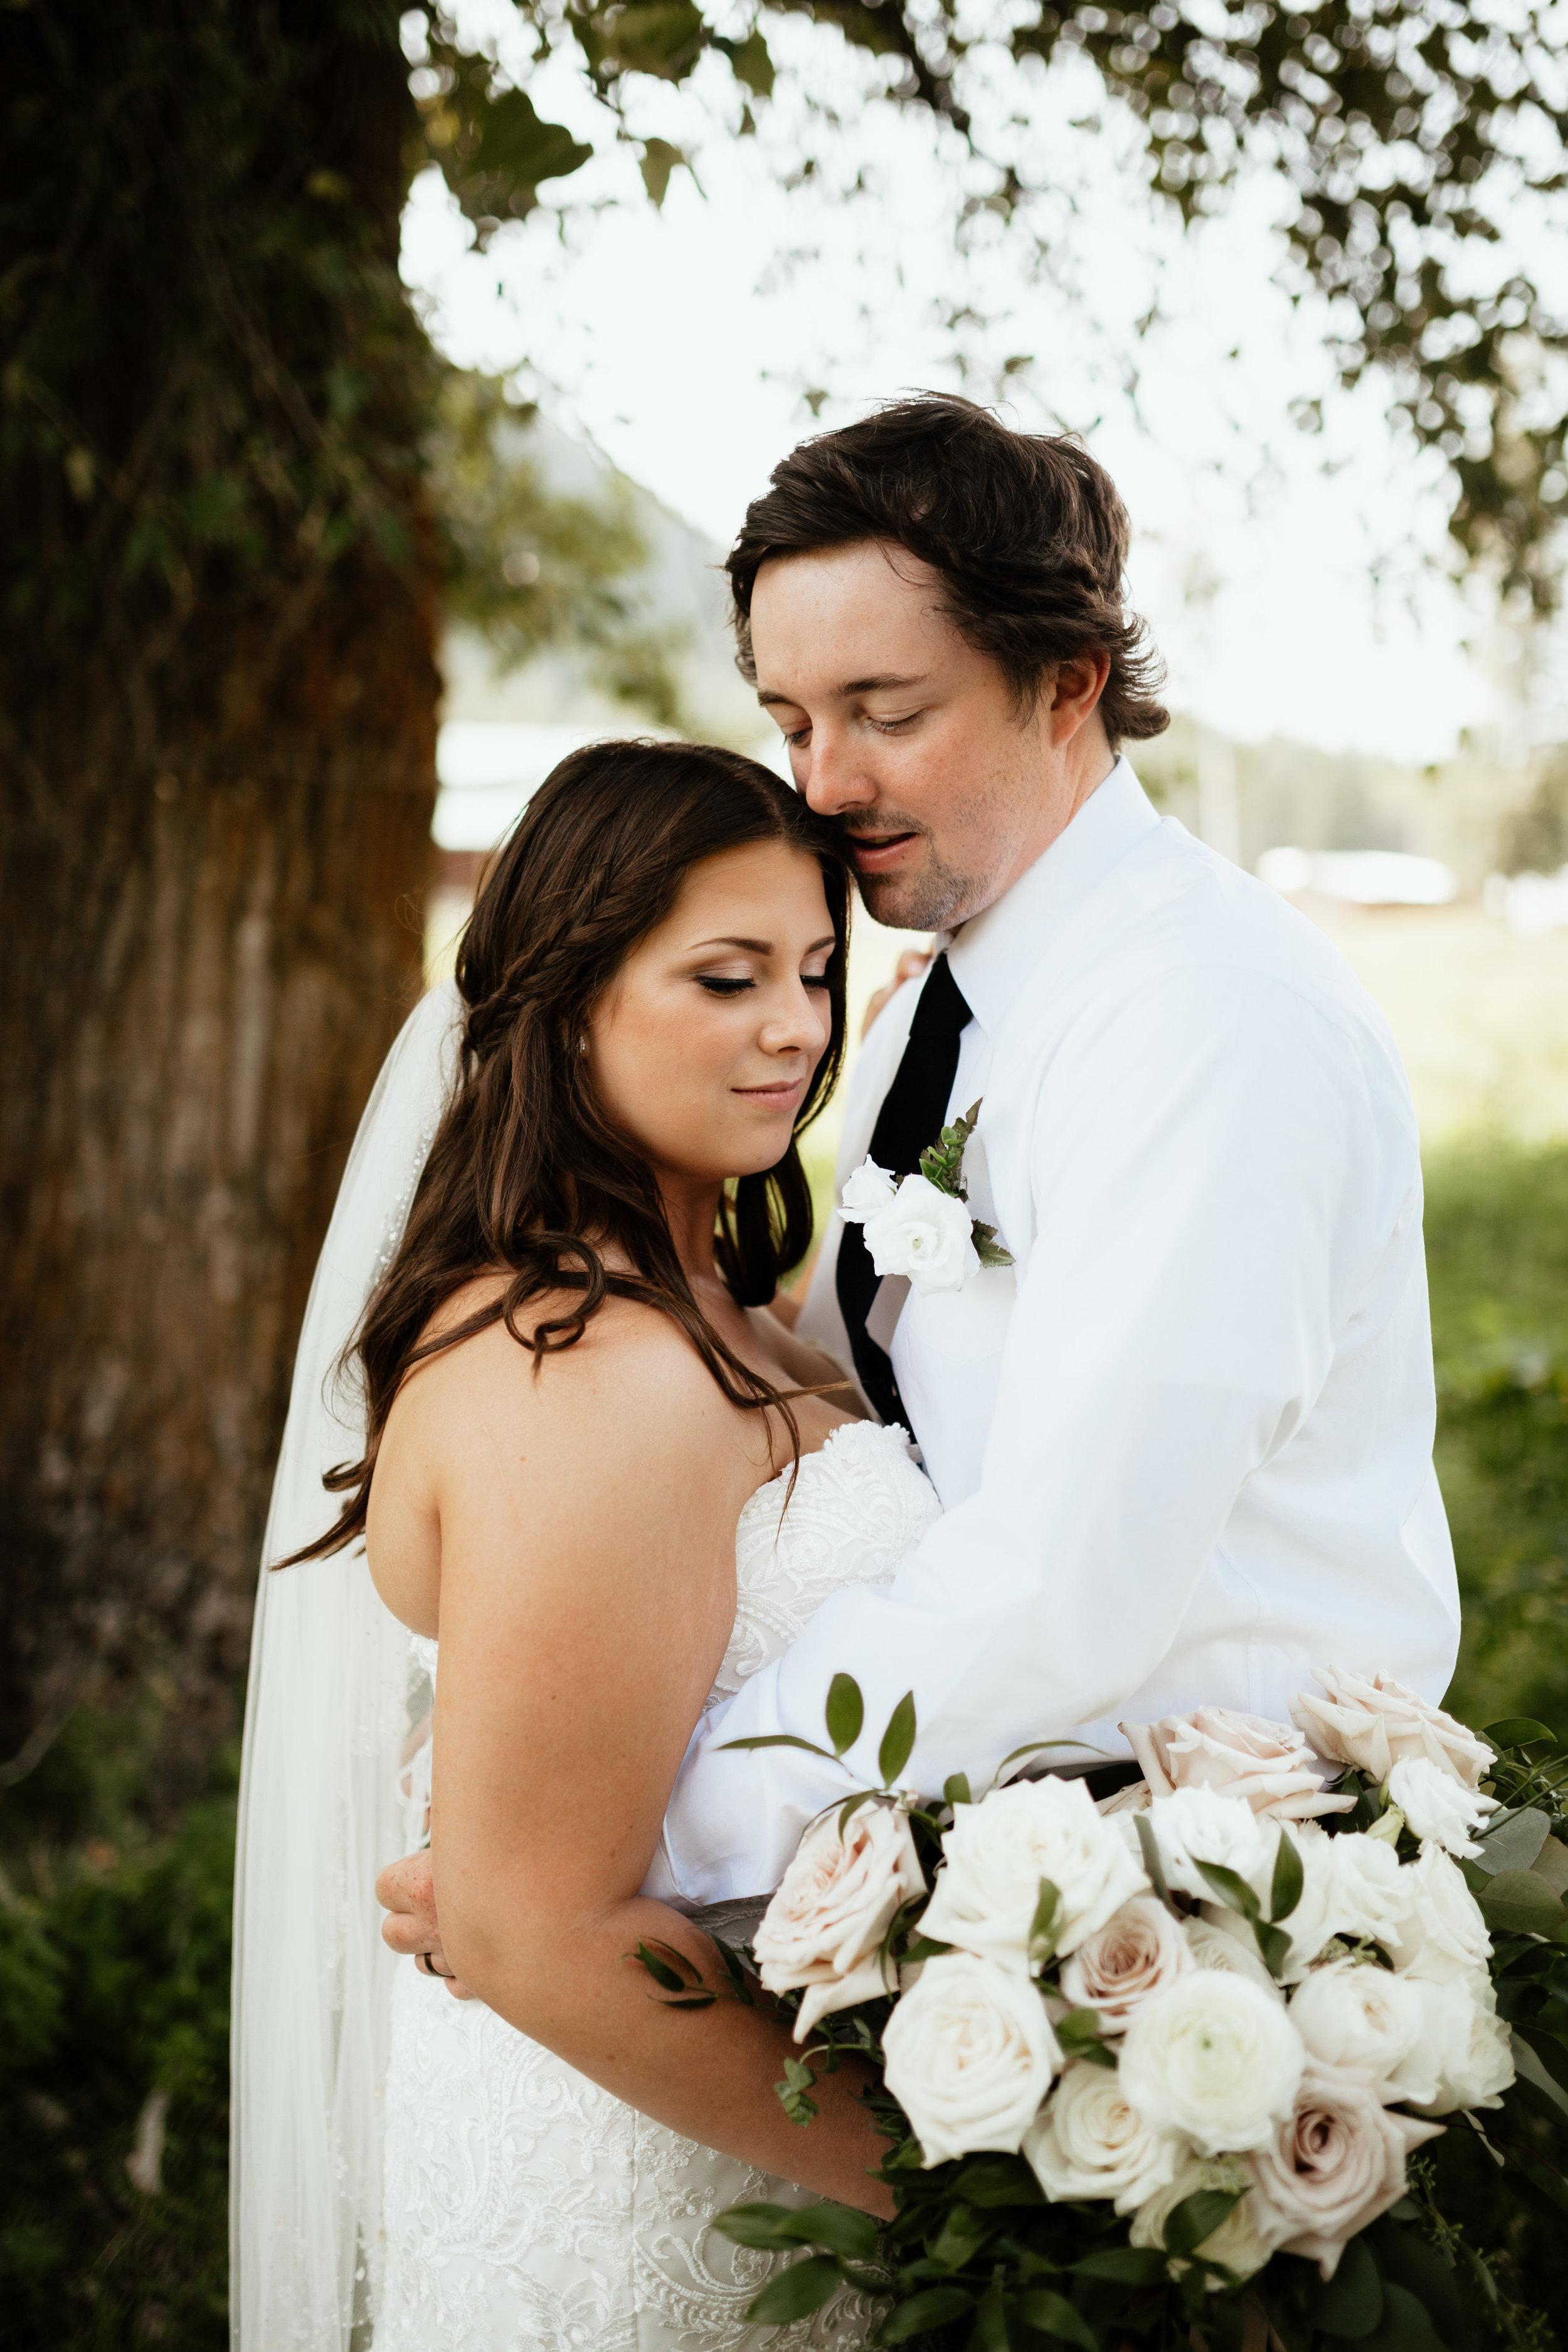 Trevor + Krista 5 - Bridal Portraits-146.jpg